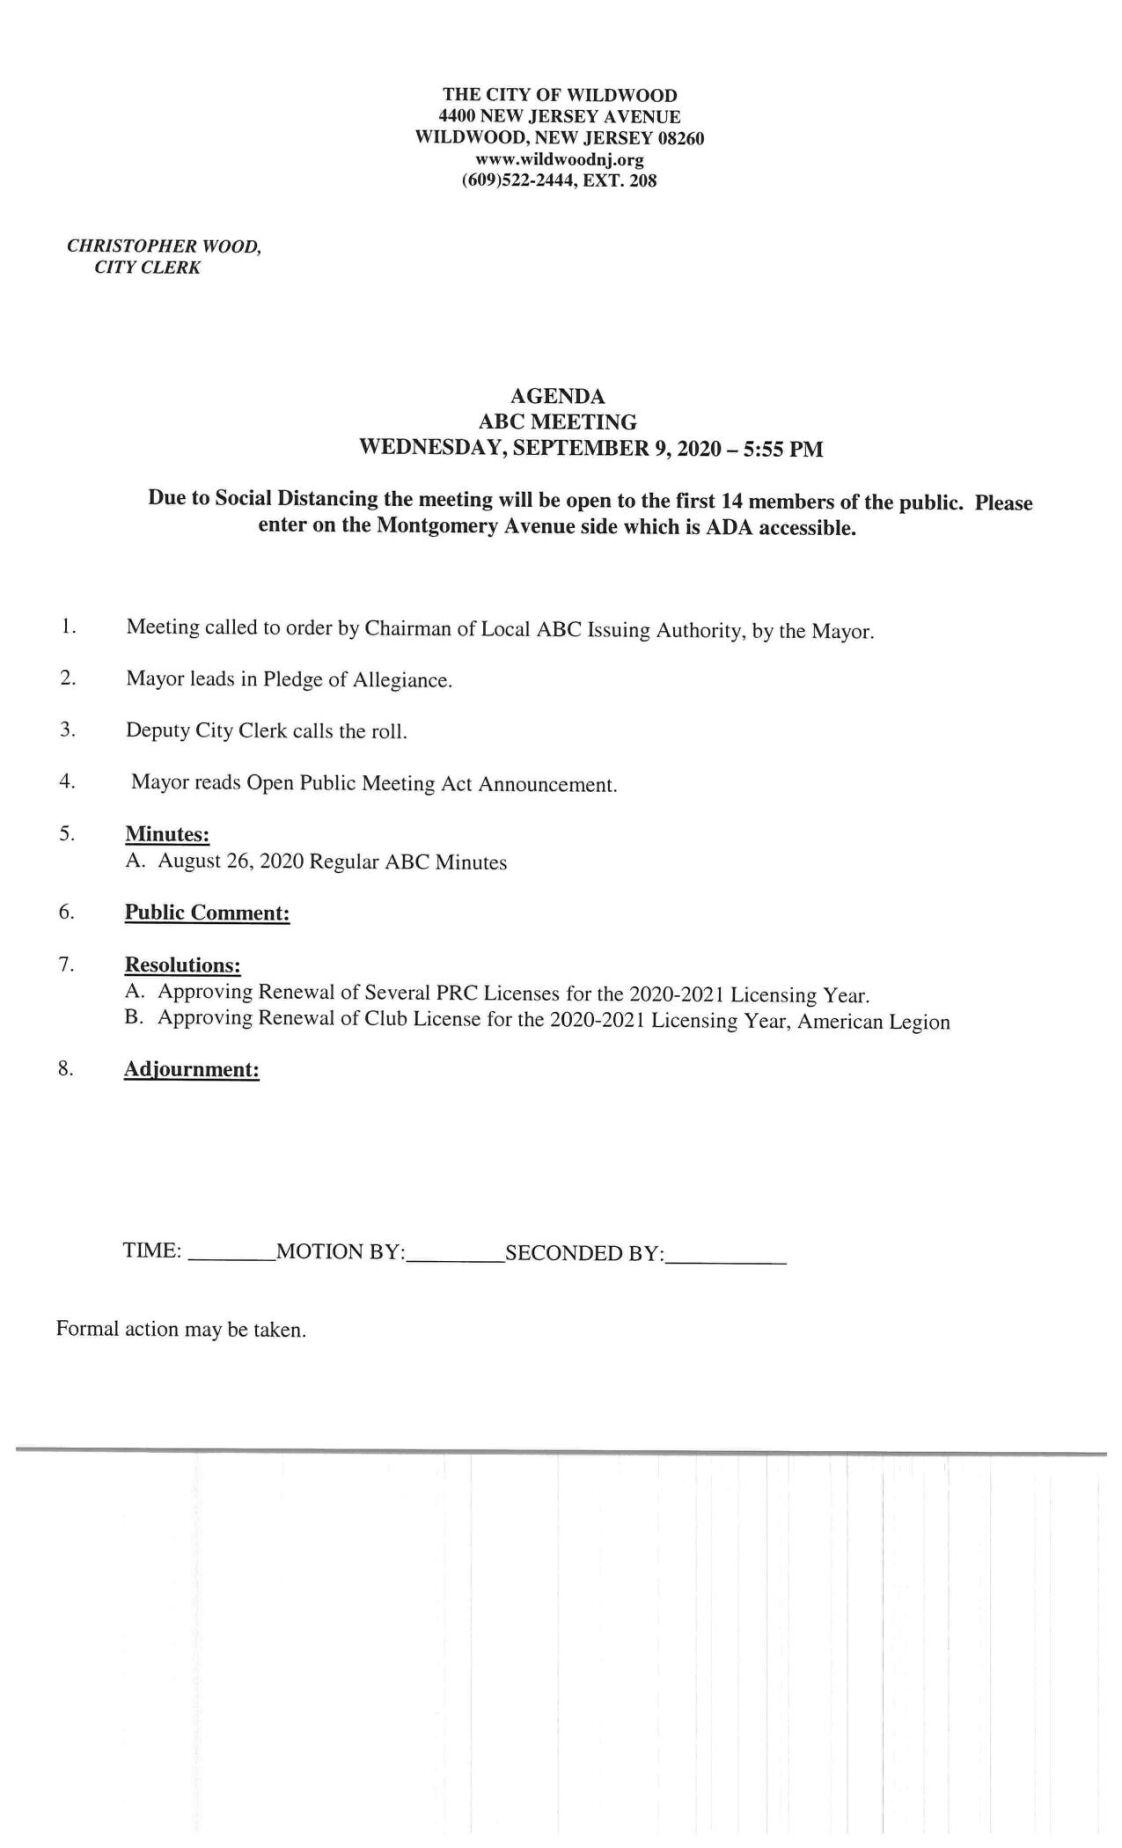 Wildwood City Commissioners Meeting Agenda Sept. 9, 2020